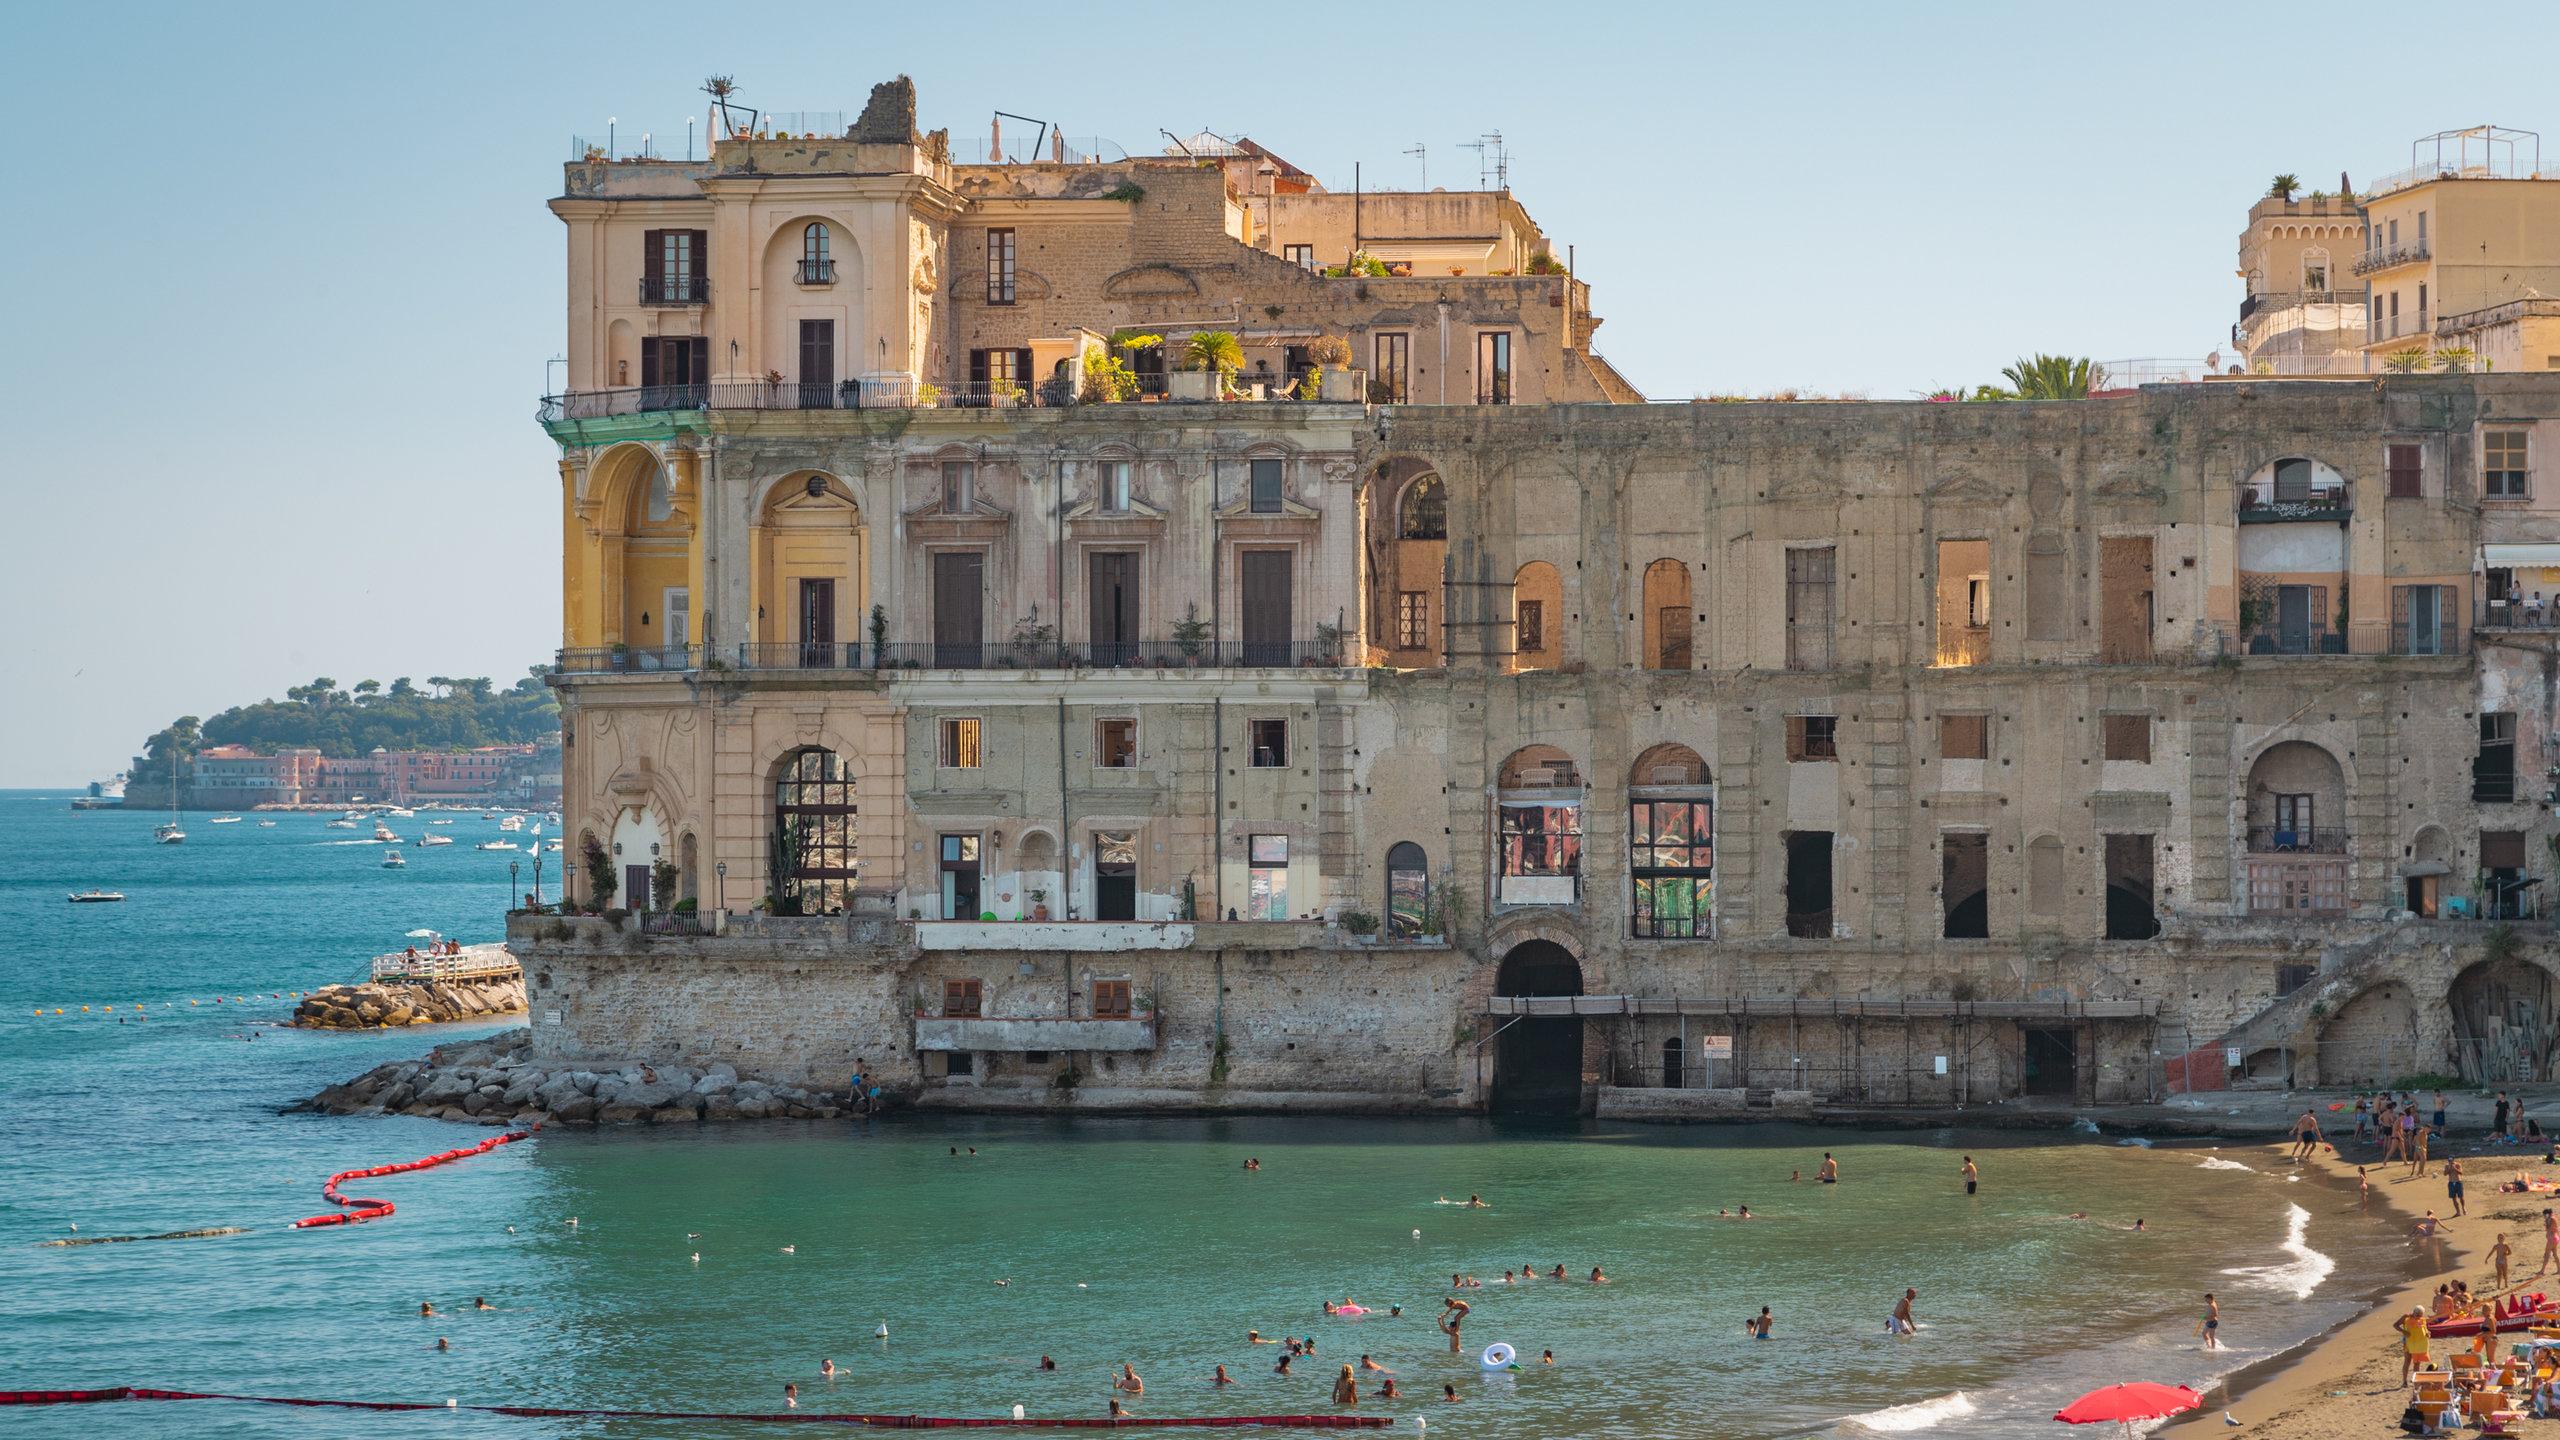 Posillipo, Naples, Campania, Italy